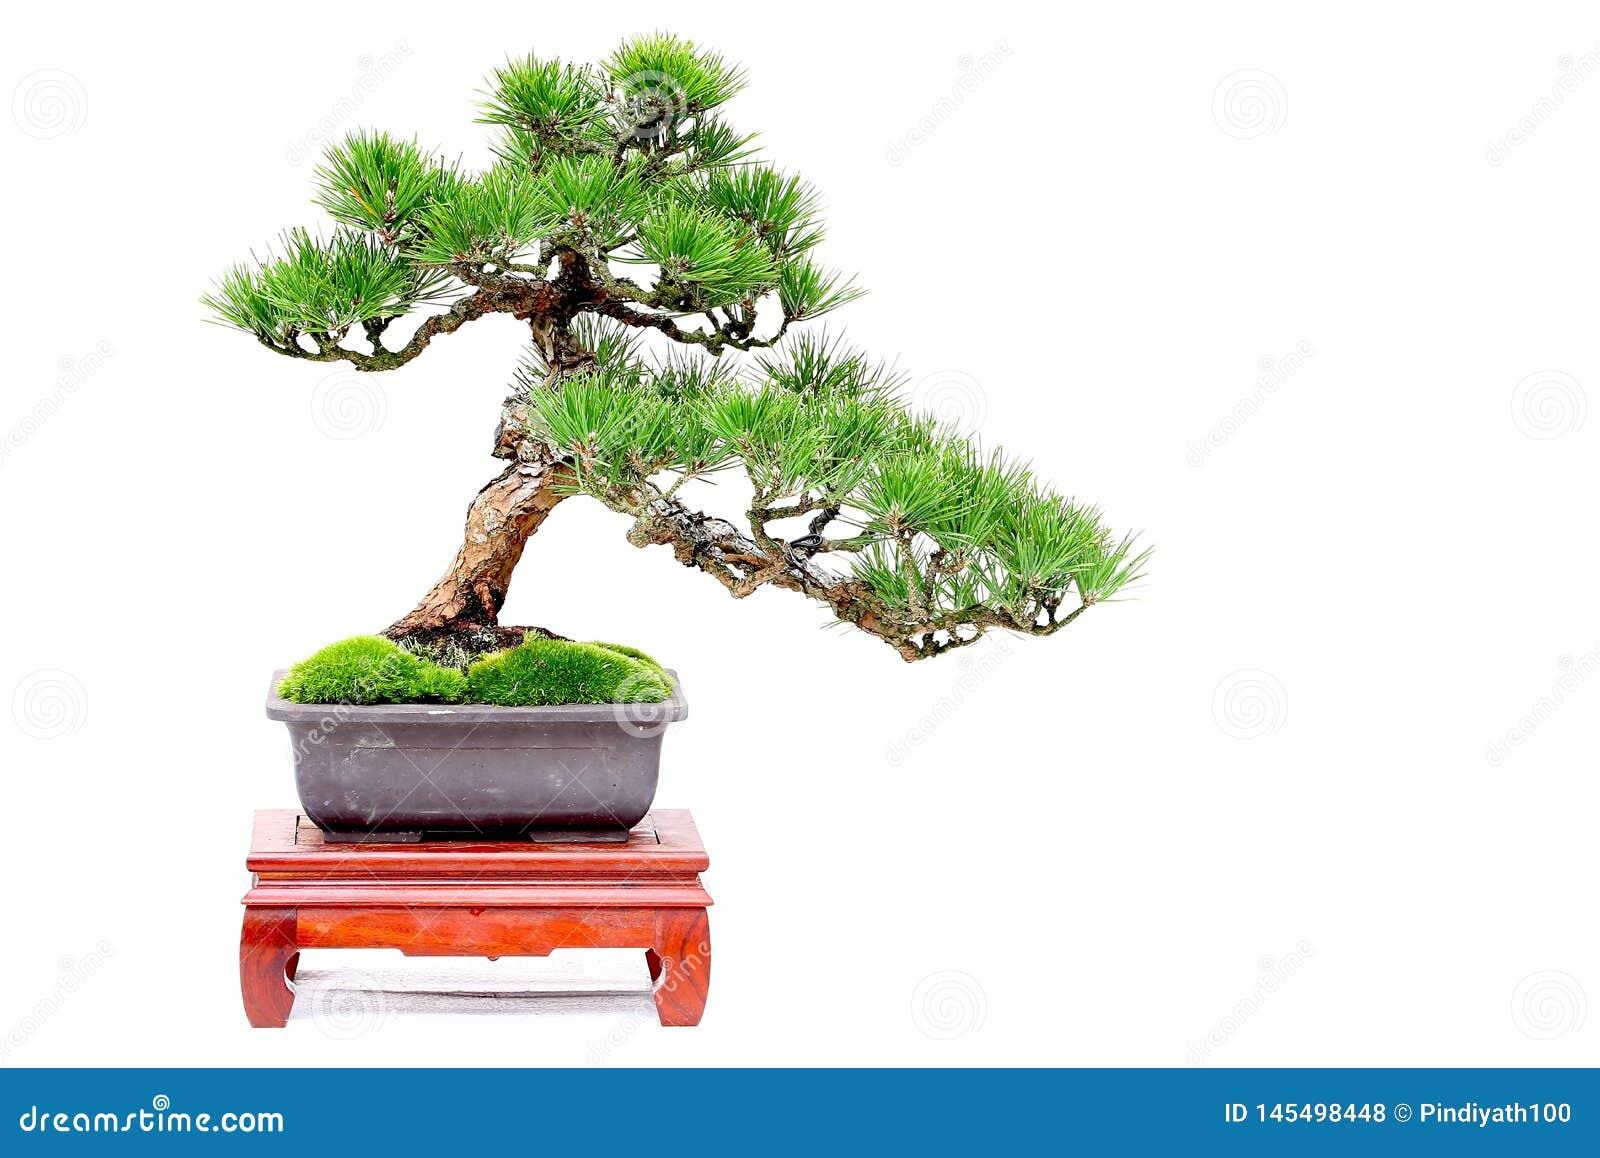 Miniature Bonsai Plant Japanese Black Pine Or Pinus Thunbergii Stock Photo Image Of Shrub Potted 145498448